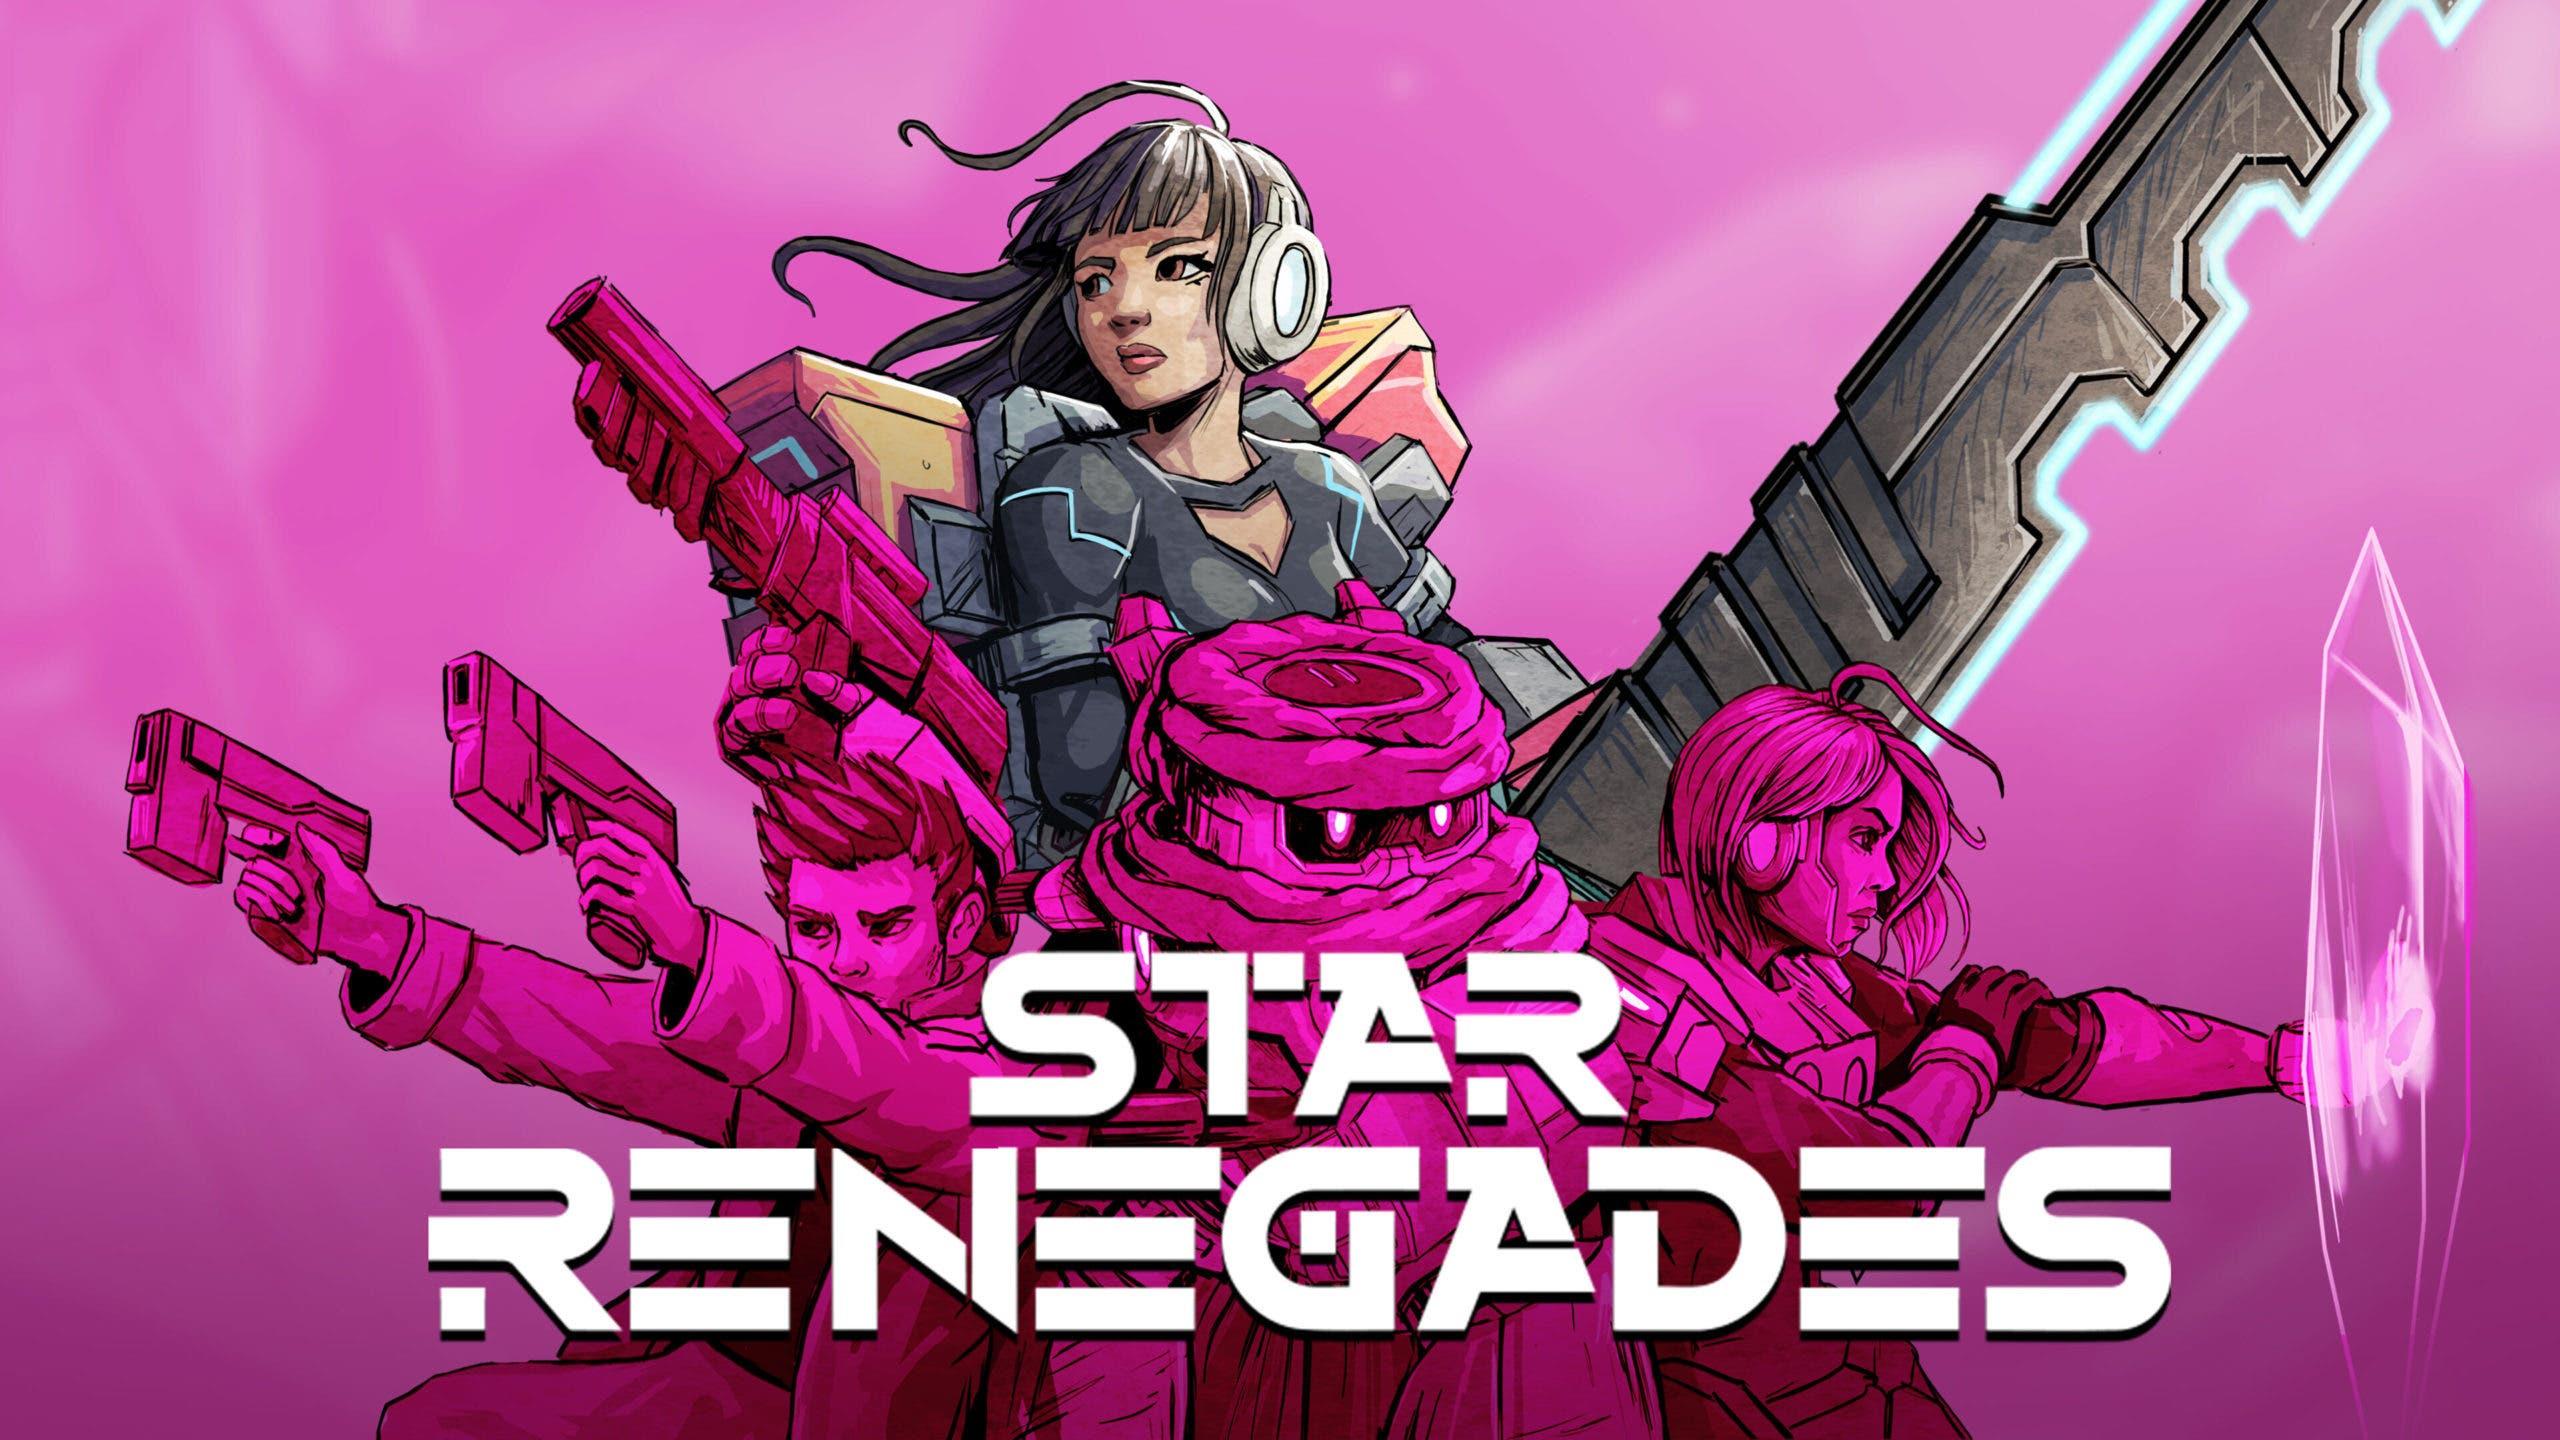 StarRenegadesKeyArt2Walpaper4k scaled